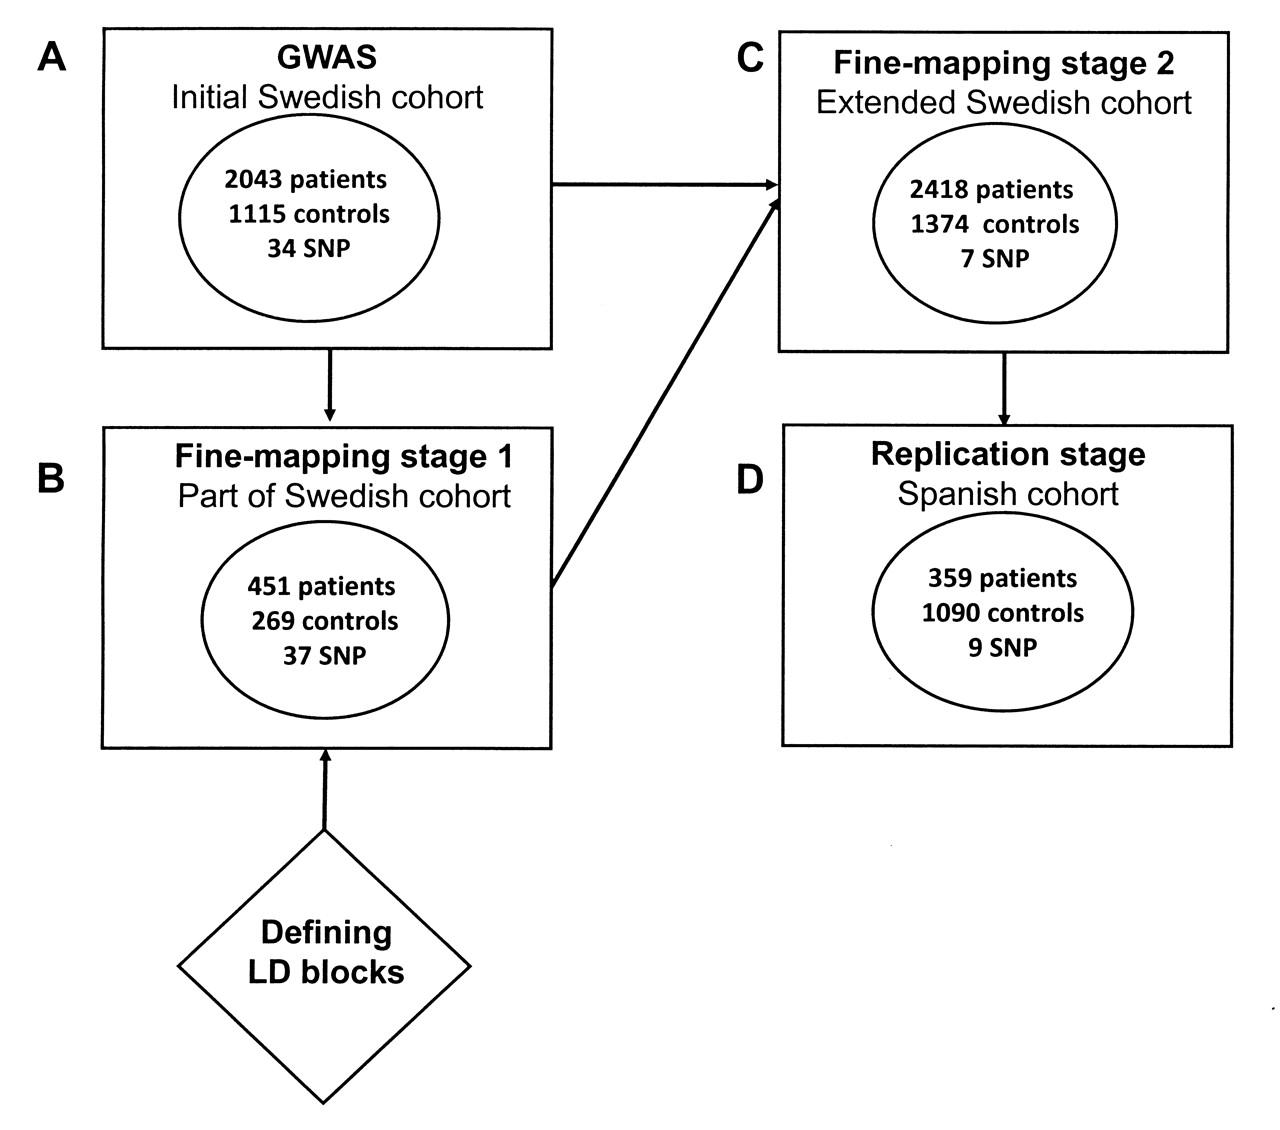 Variants Within Stat Genes Reveal Association With Anticitrullinated Protein Antibody Negative Rheumatoid Arthritis In 2 European Populations The Journal Of Rheumatology